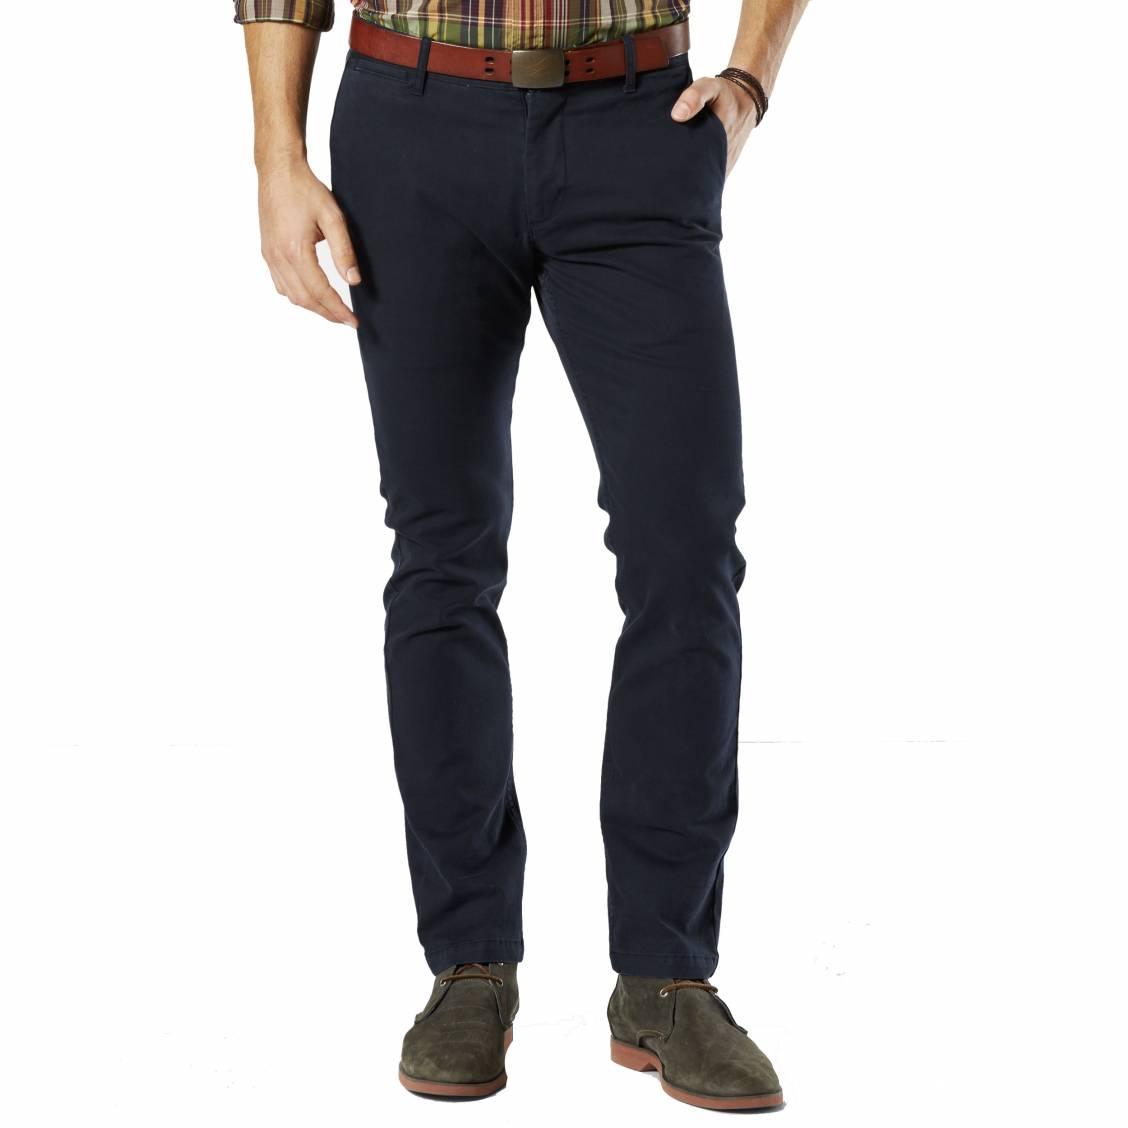 Pantalon pacific washed khaki slim tapered  en twill bleu marine